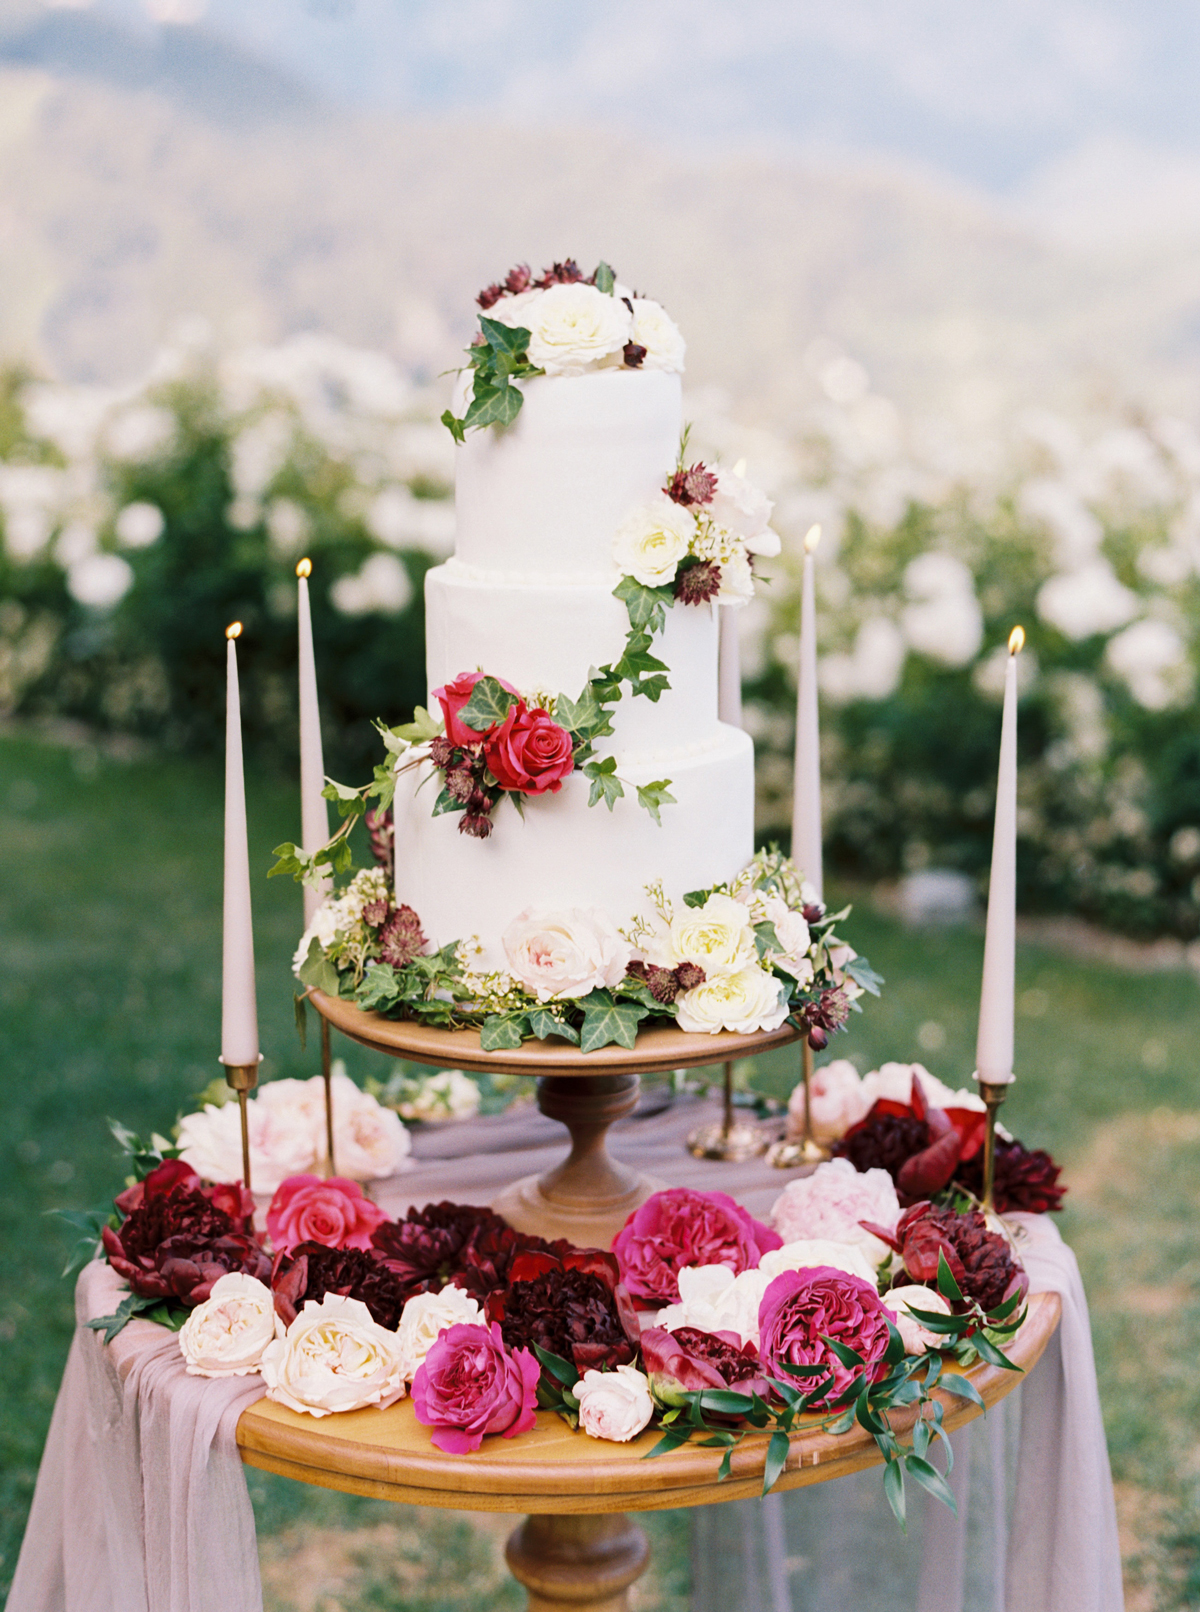 allie and joe italy wedding white wedding cake decorated with roses